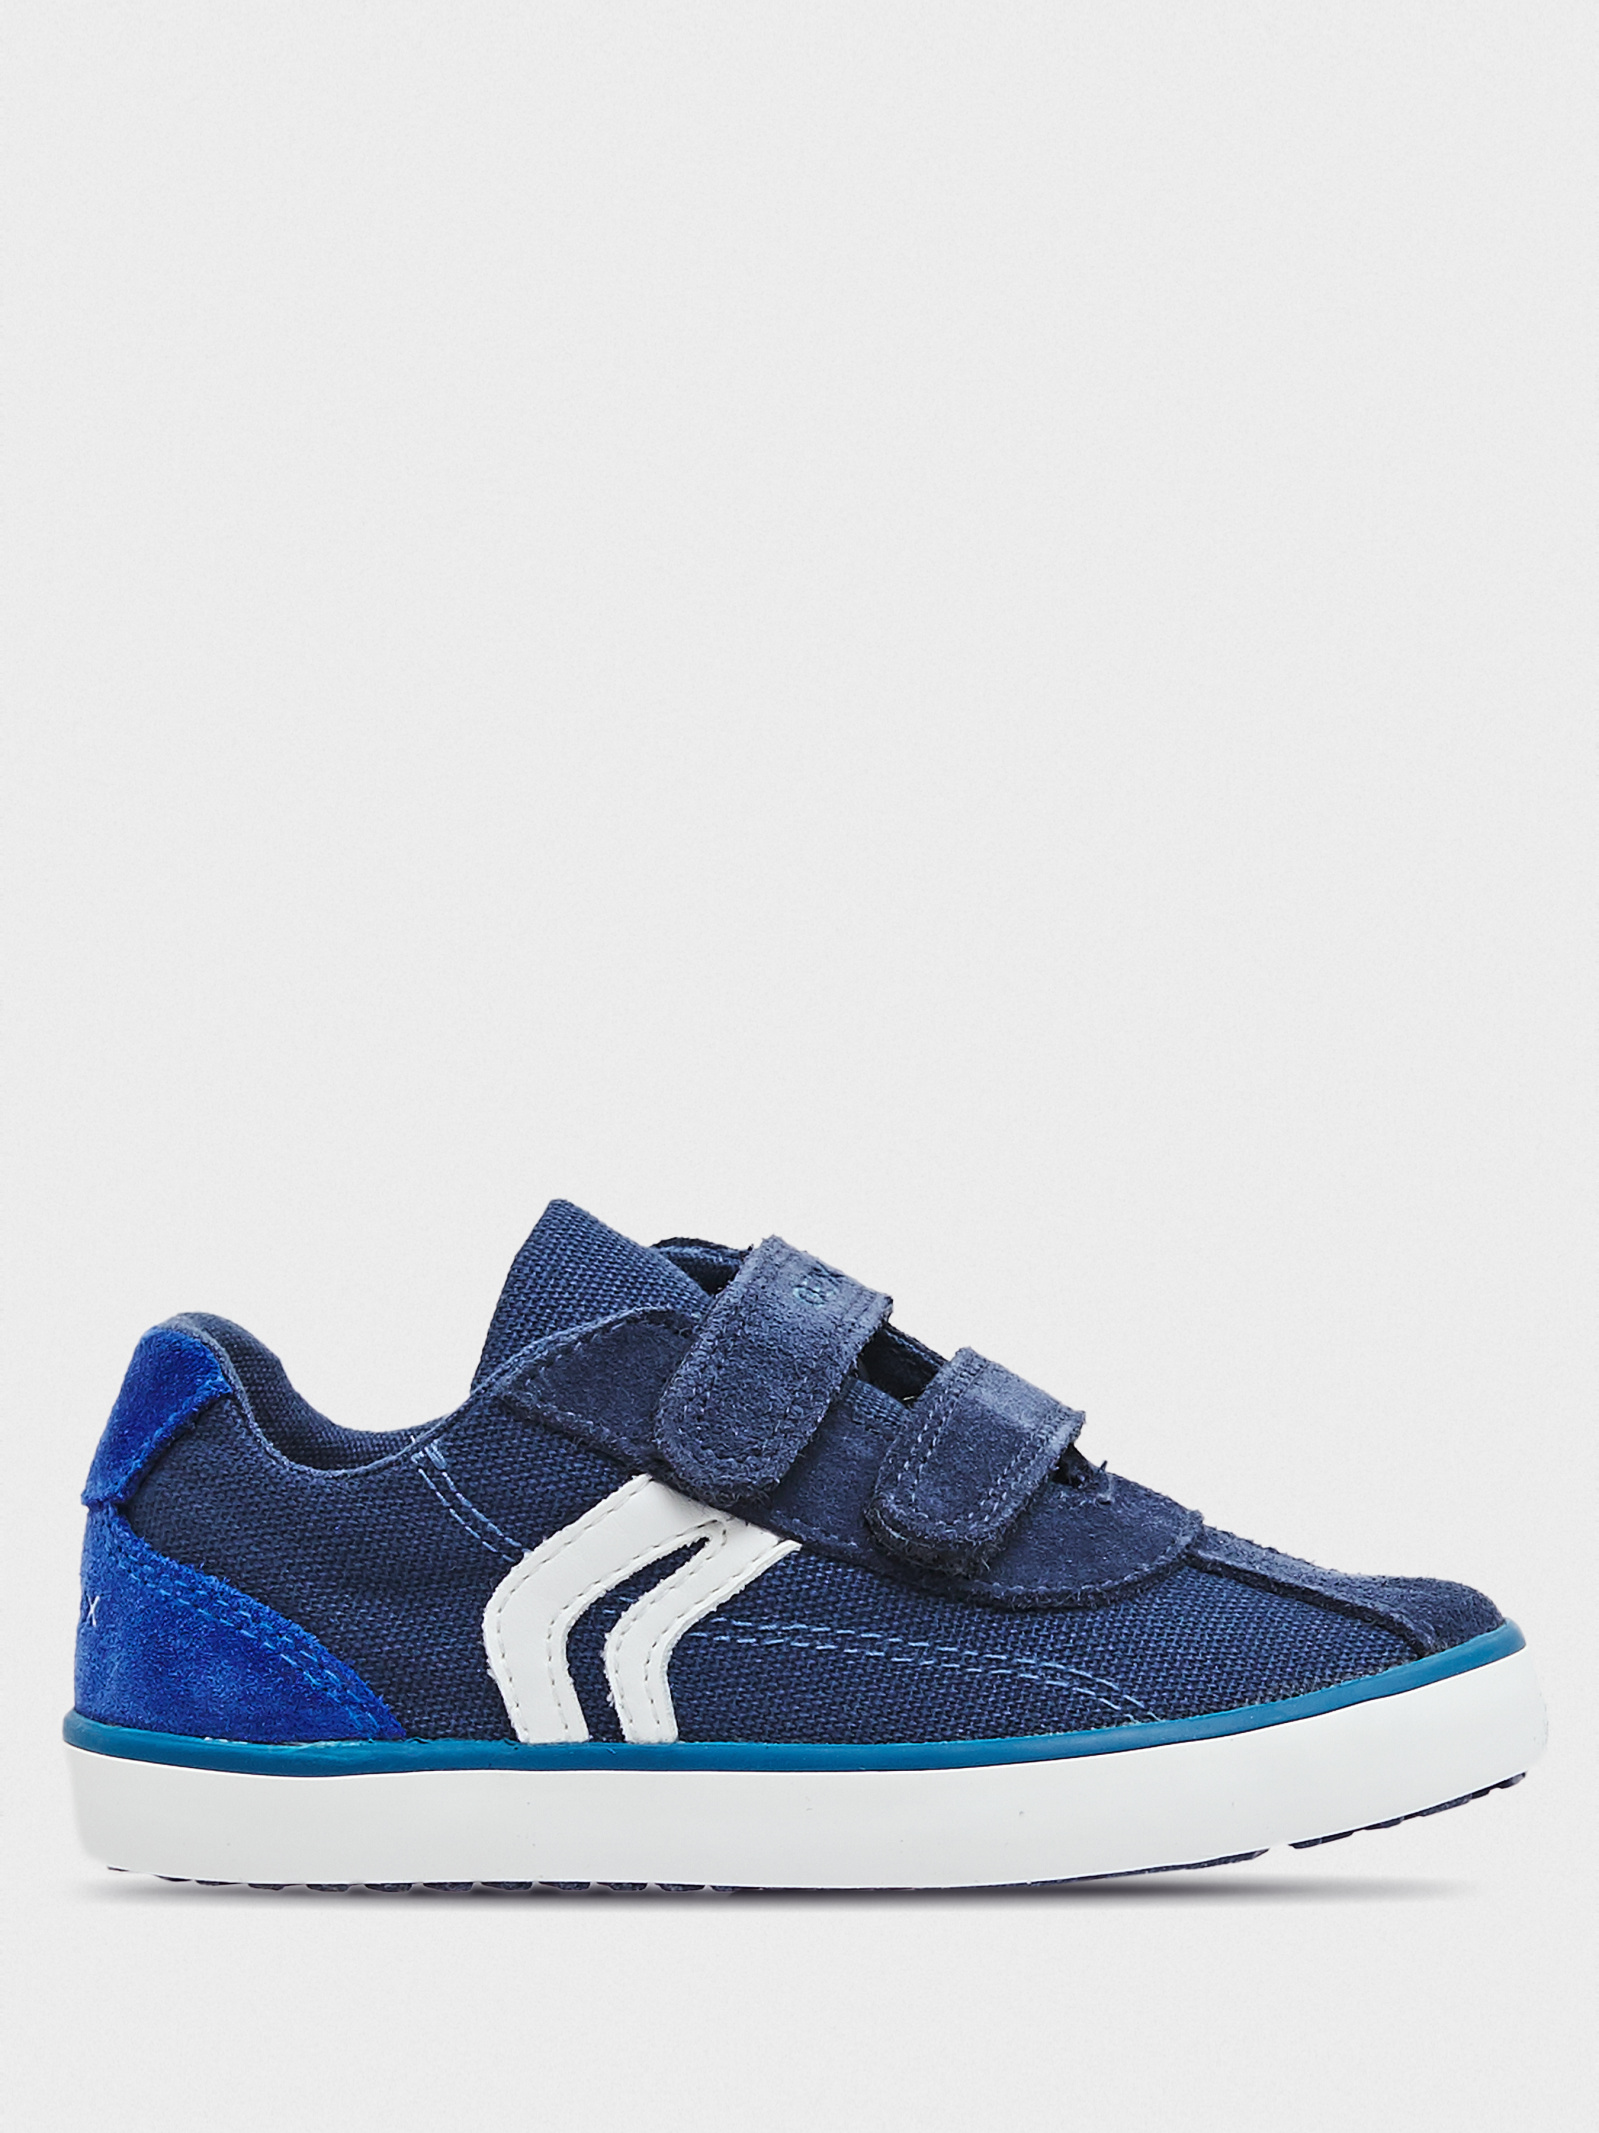 Полуботинки детские Geox B KILWI BOY B82A7G-01022-C4226 модная обувь, 2017